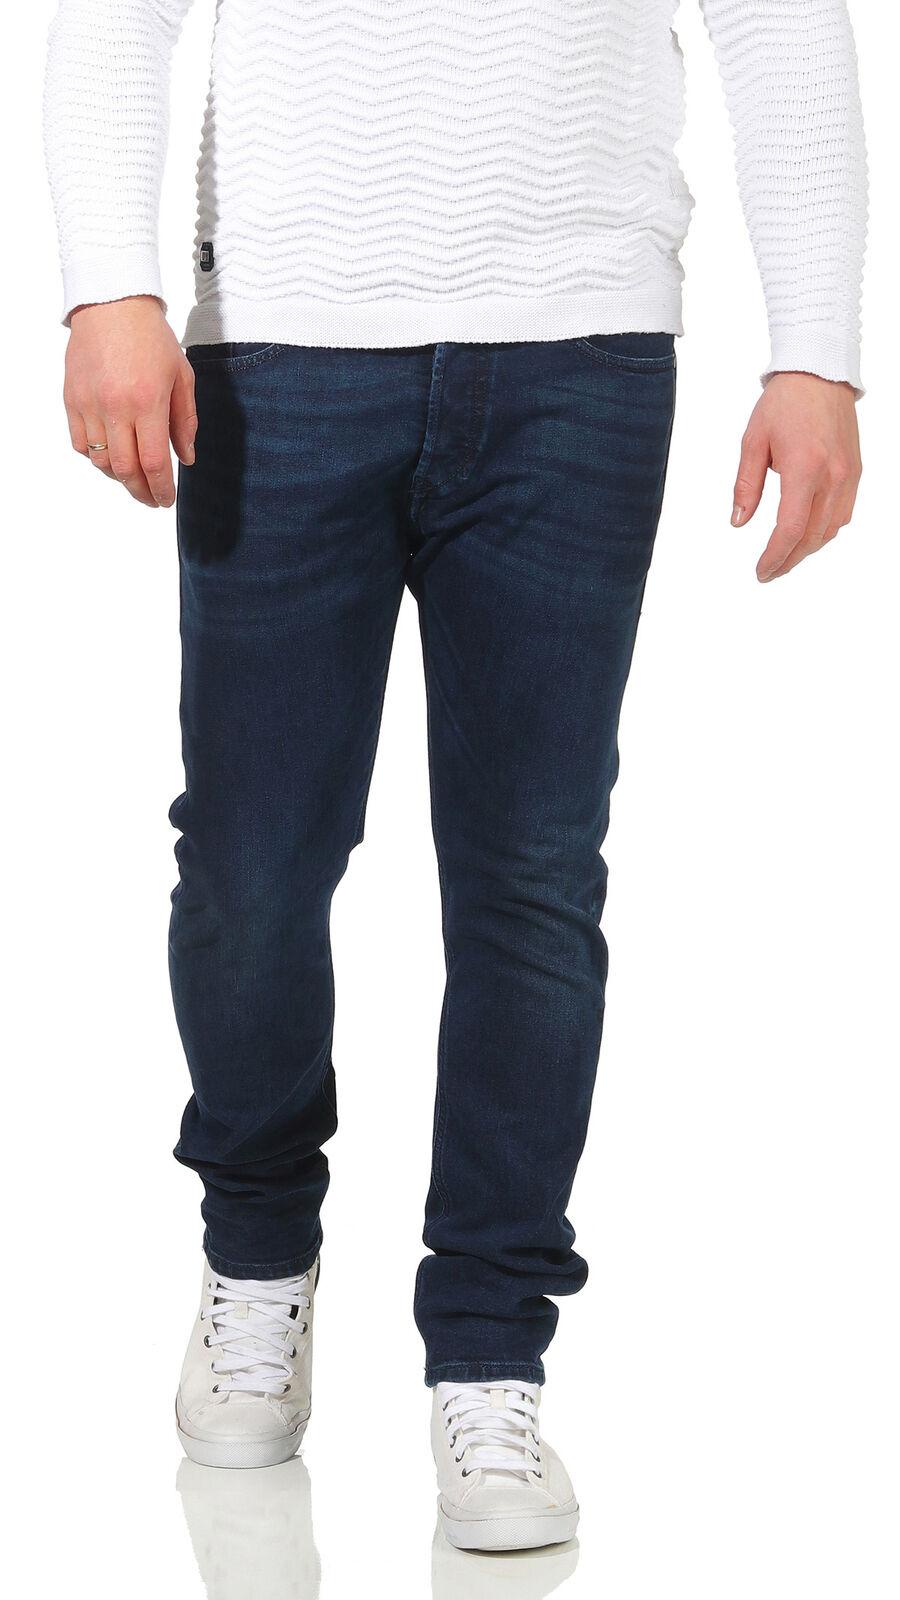 Diesel Jeans Tepphar 084ZC Men's Stretch Slim Carred Skinny Jeans Dark bluee